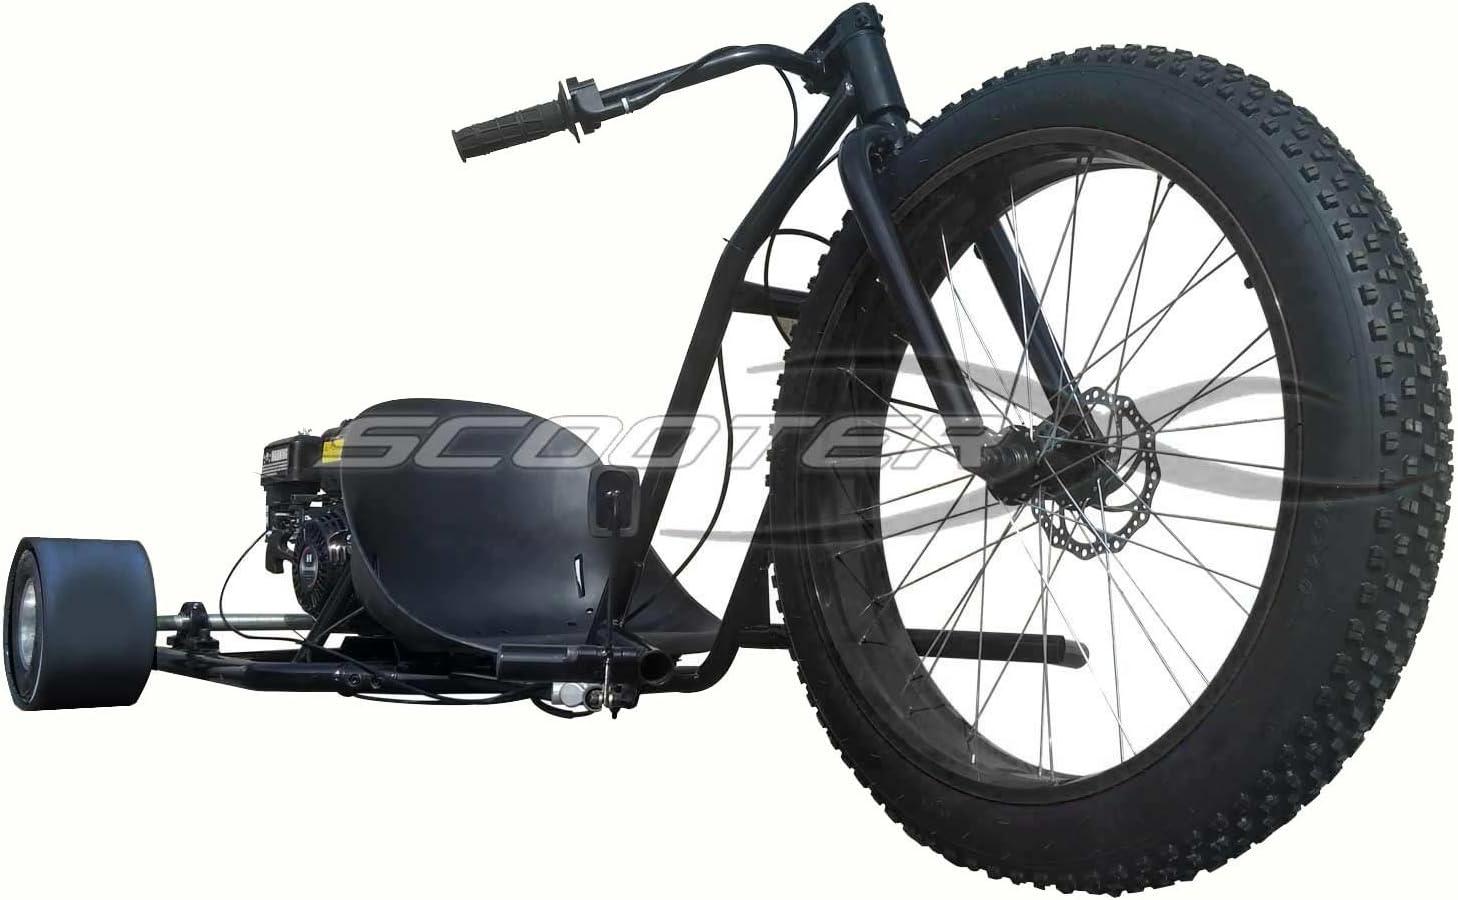 Scooter X Motorized Electric Drift Trike